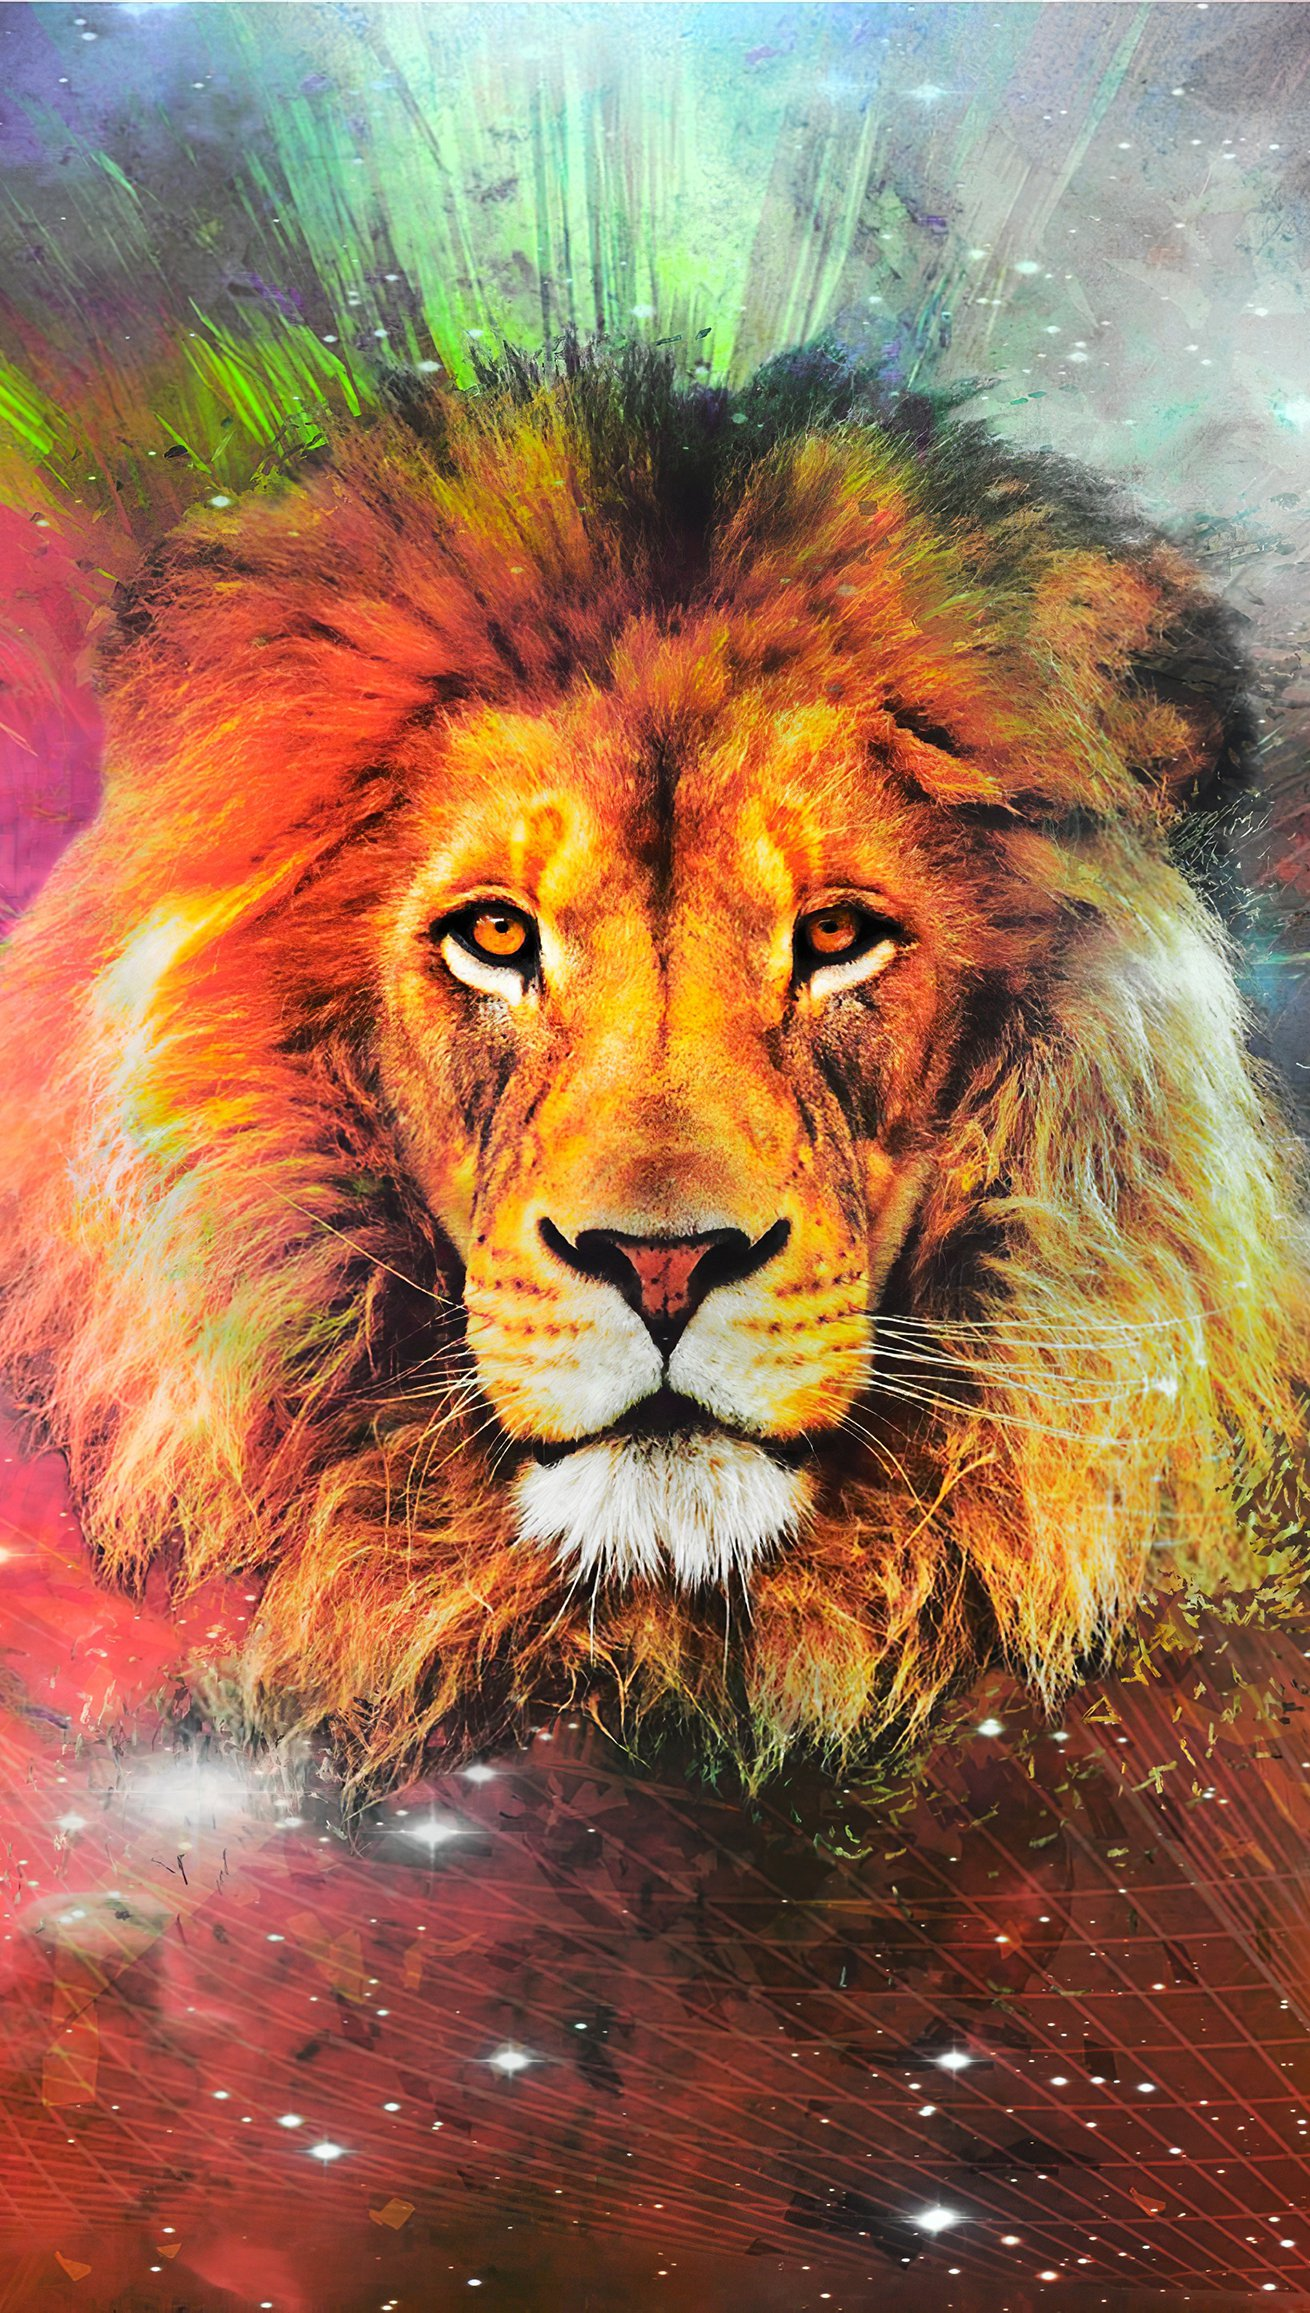 Wallpaper Lion in Galaxy Vertical